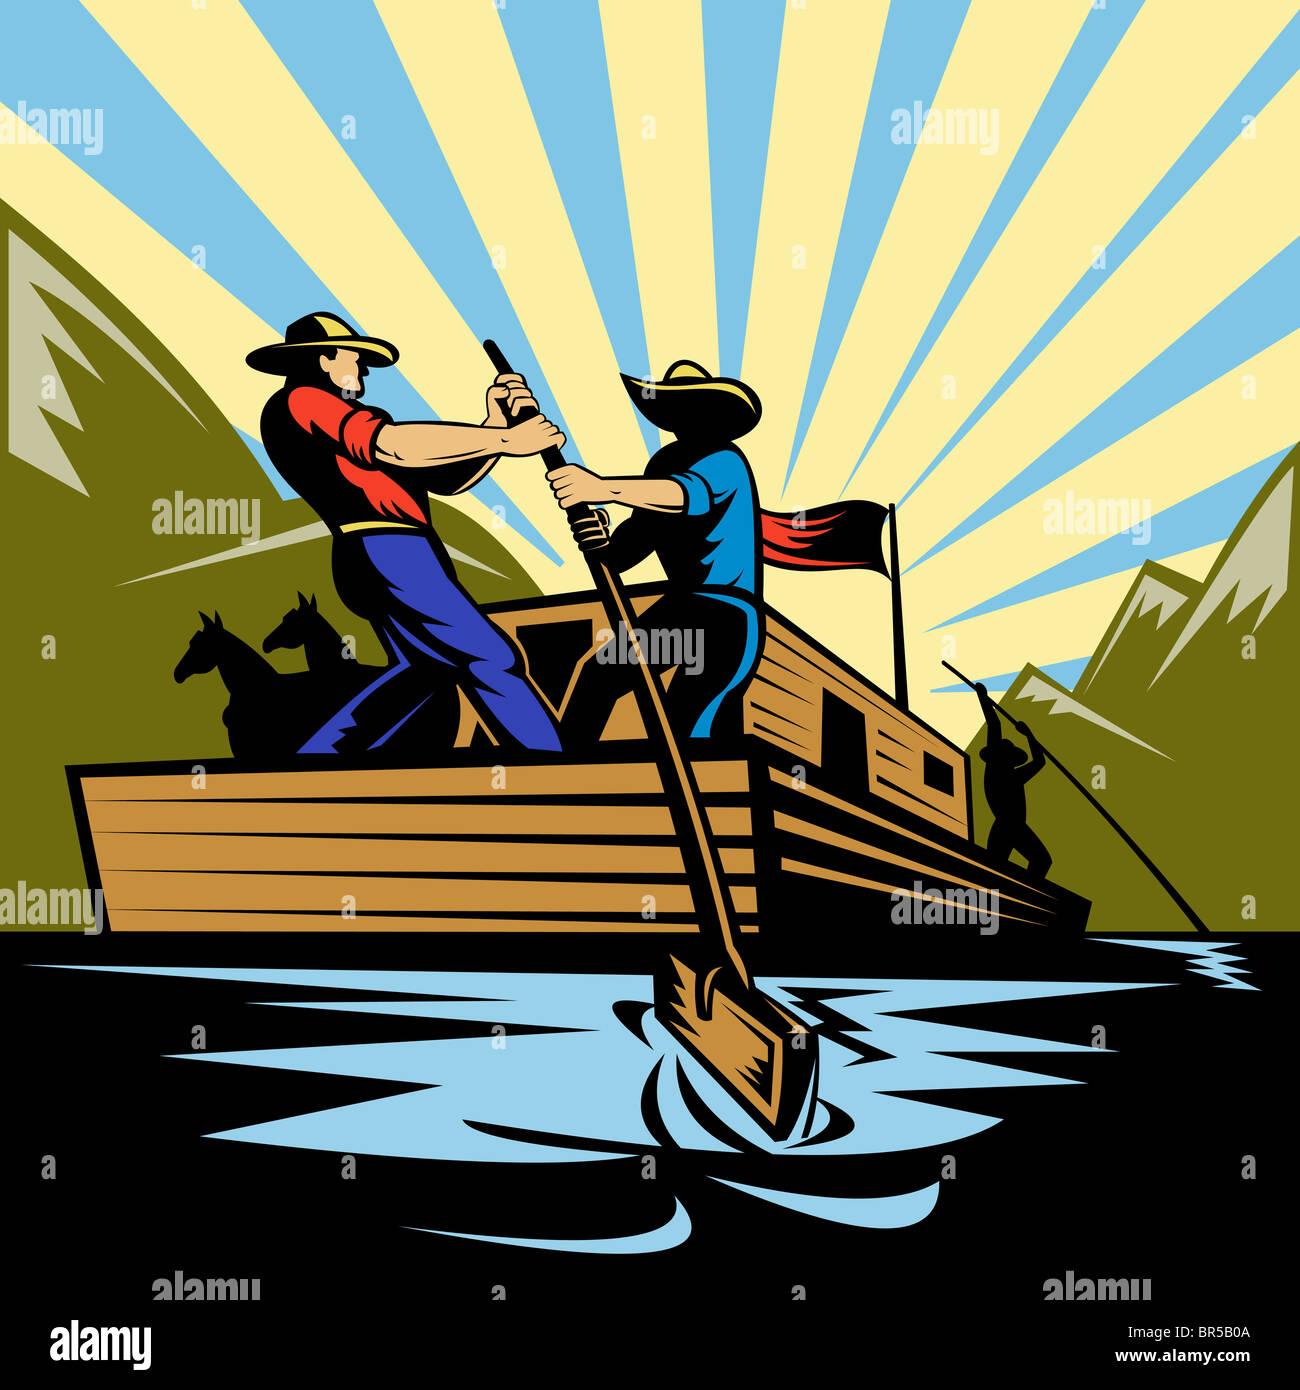 Illustration of a Cowboy man steering flatboat along river Stock Photo